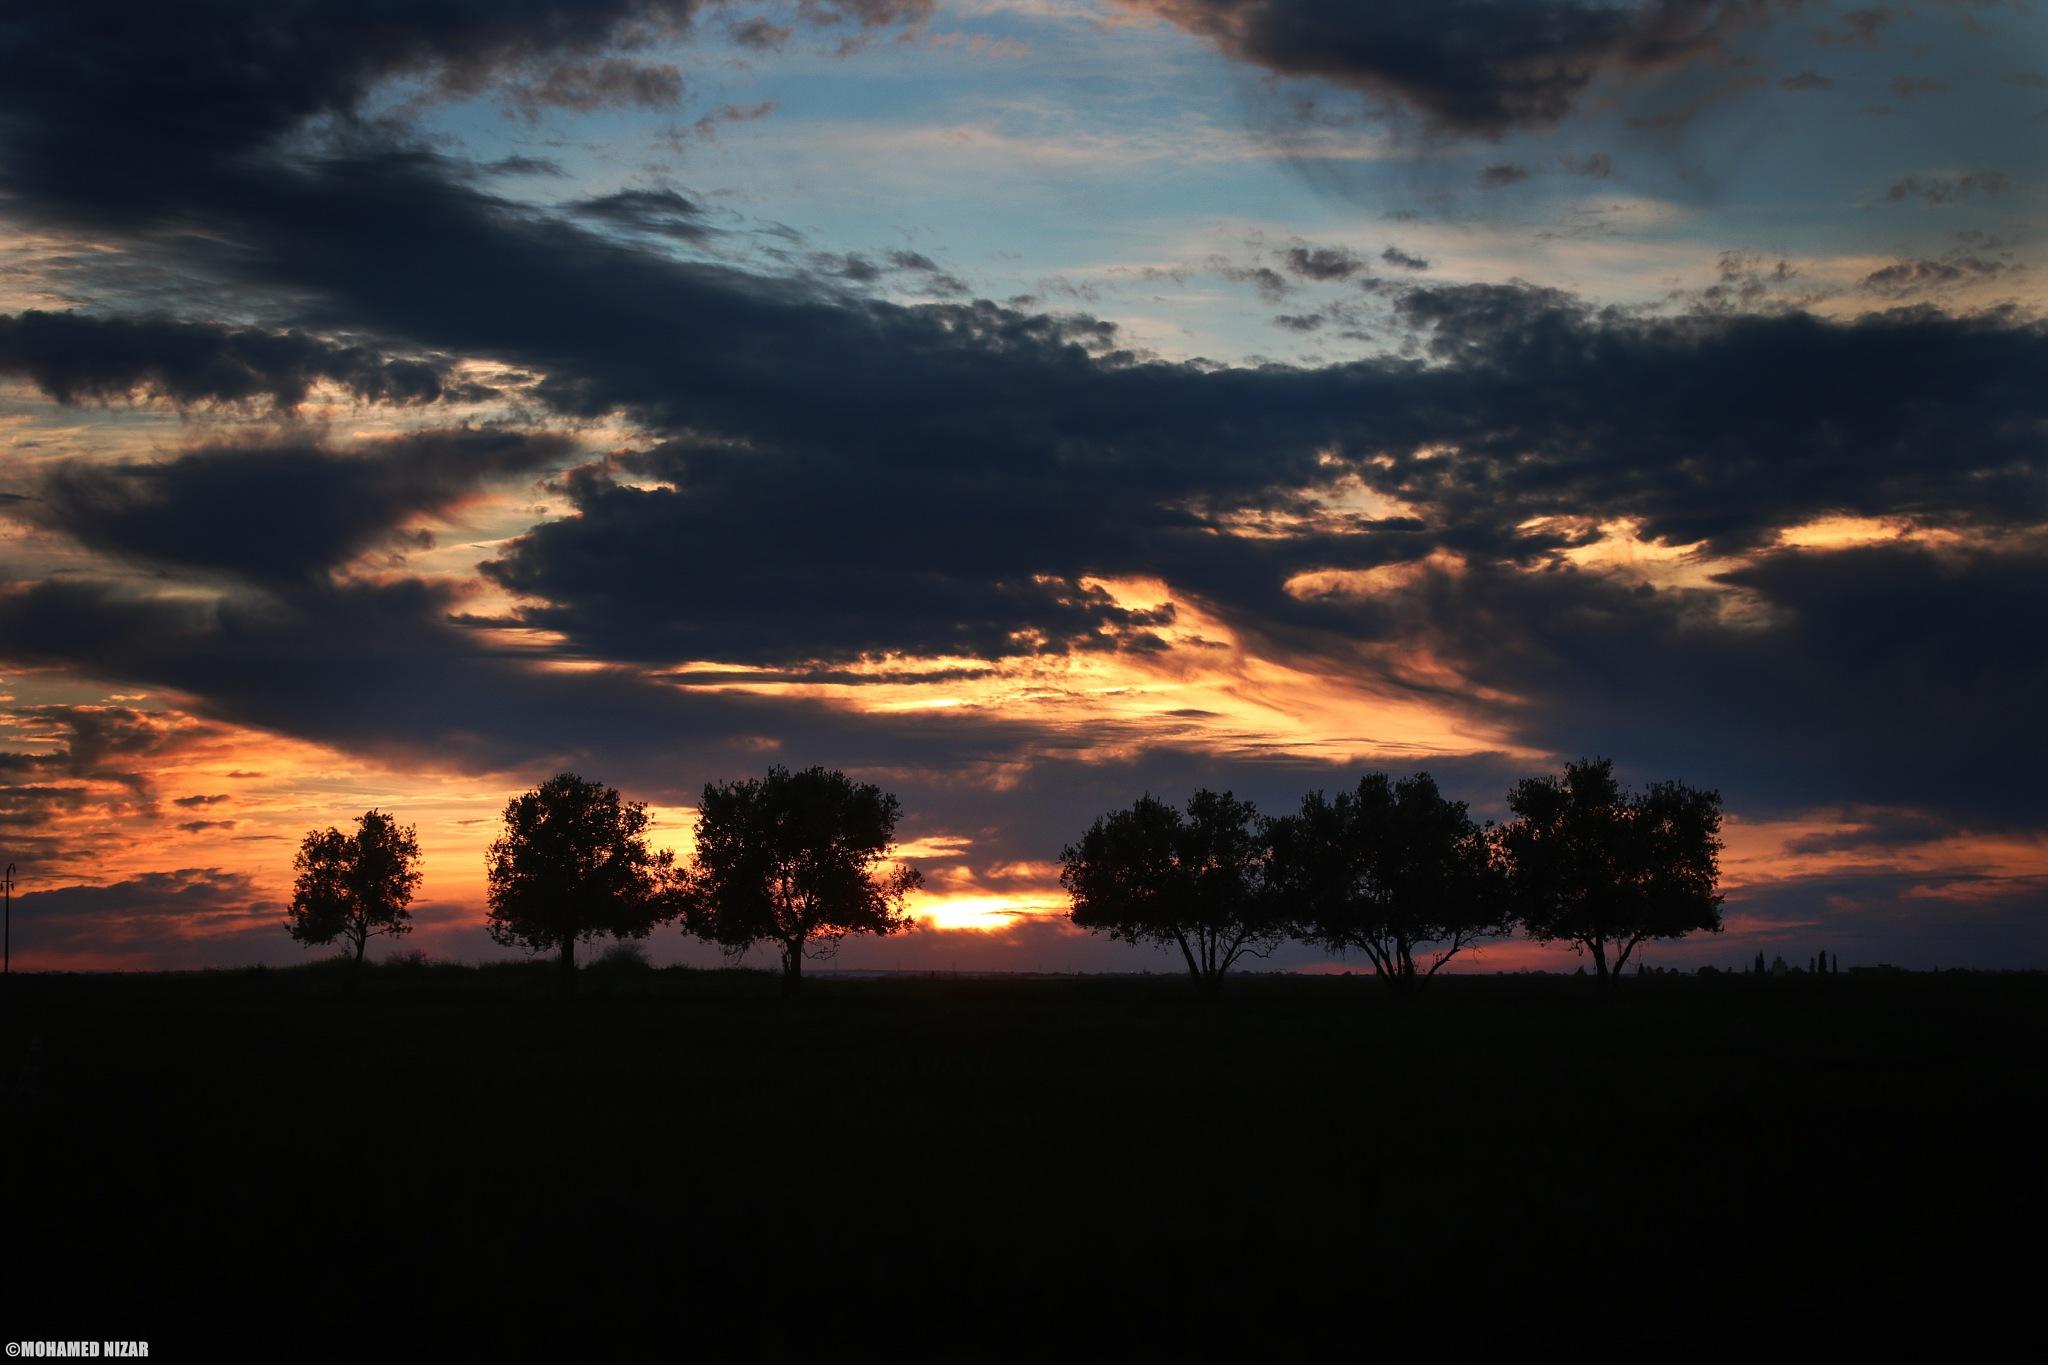 Sunset by Mohamed Nizar Photography